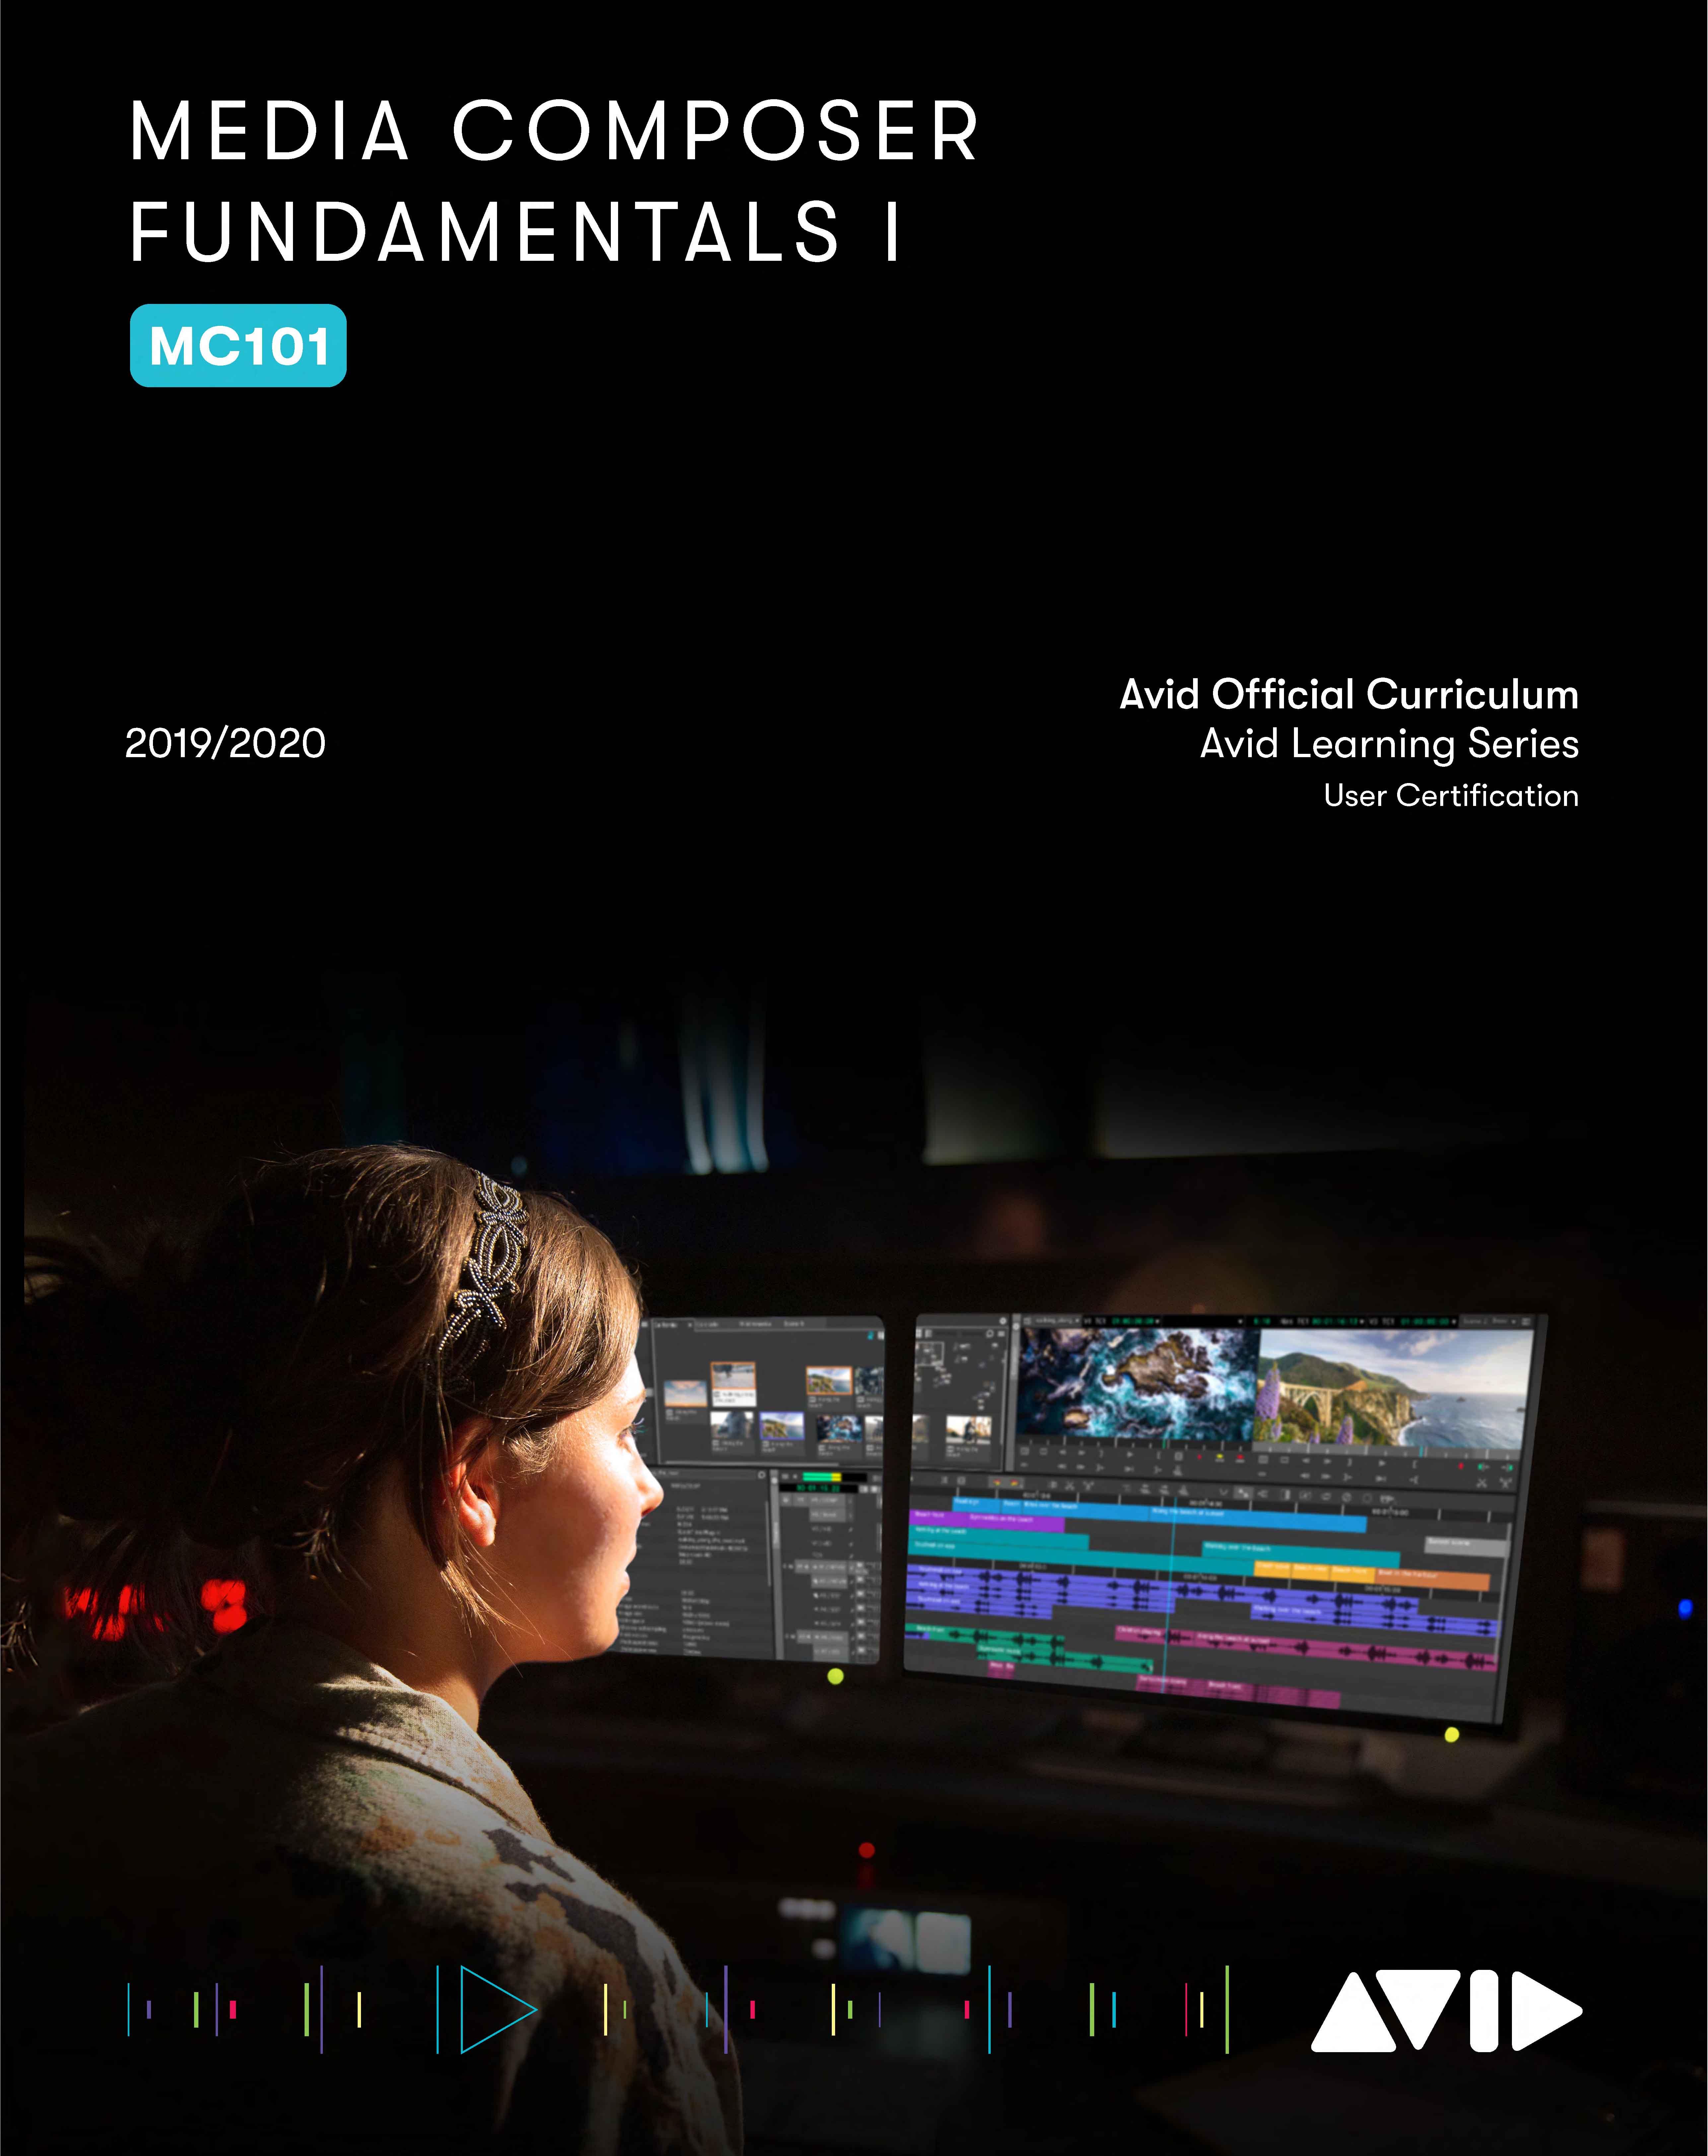 Shop Media Composer 101 Media Composer Fundamentals I Book Avid